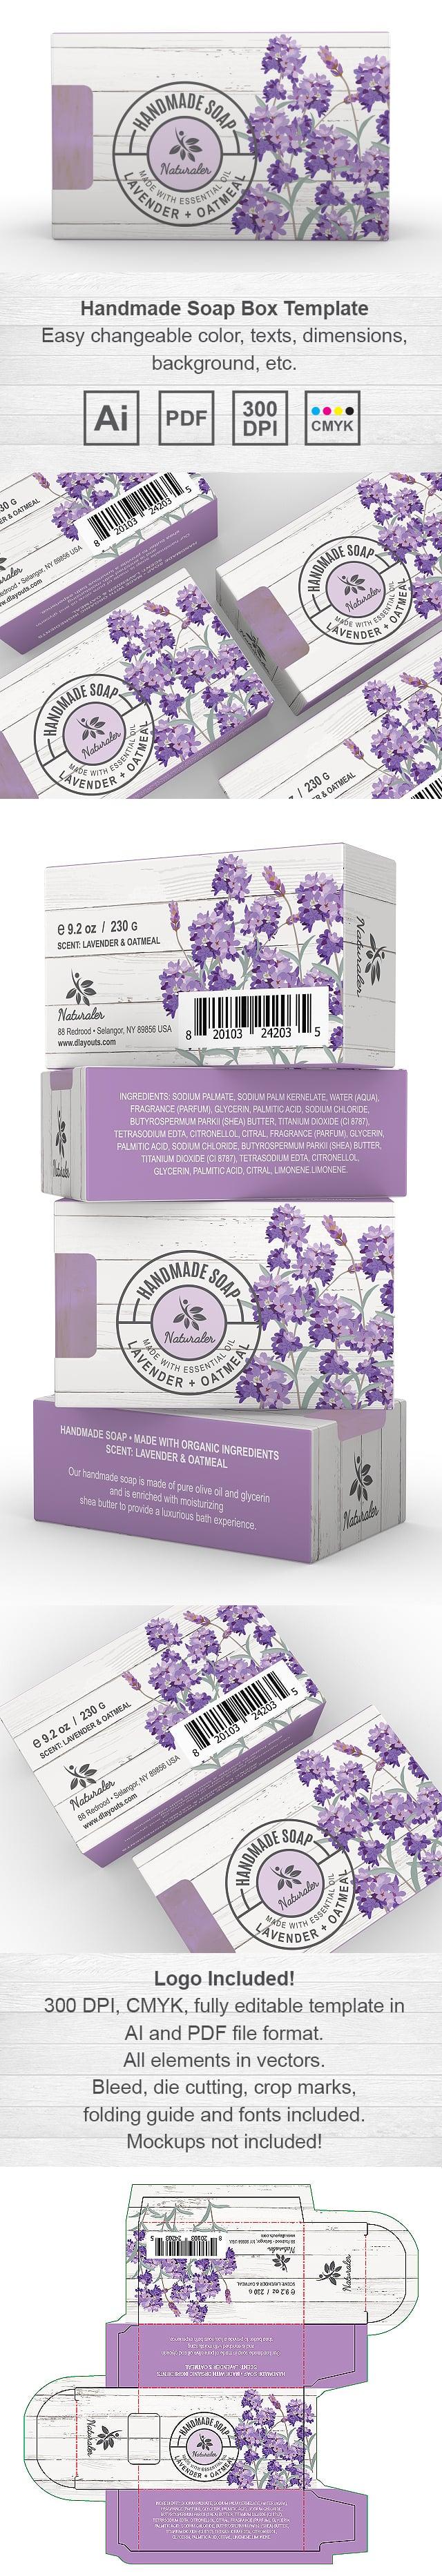 Handmade Lavender Soap Packaging Template